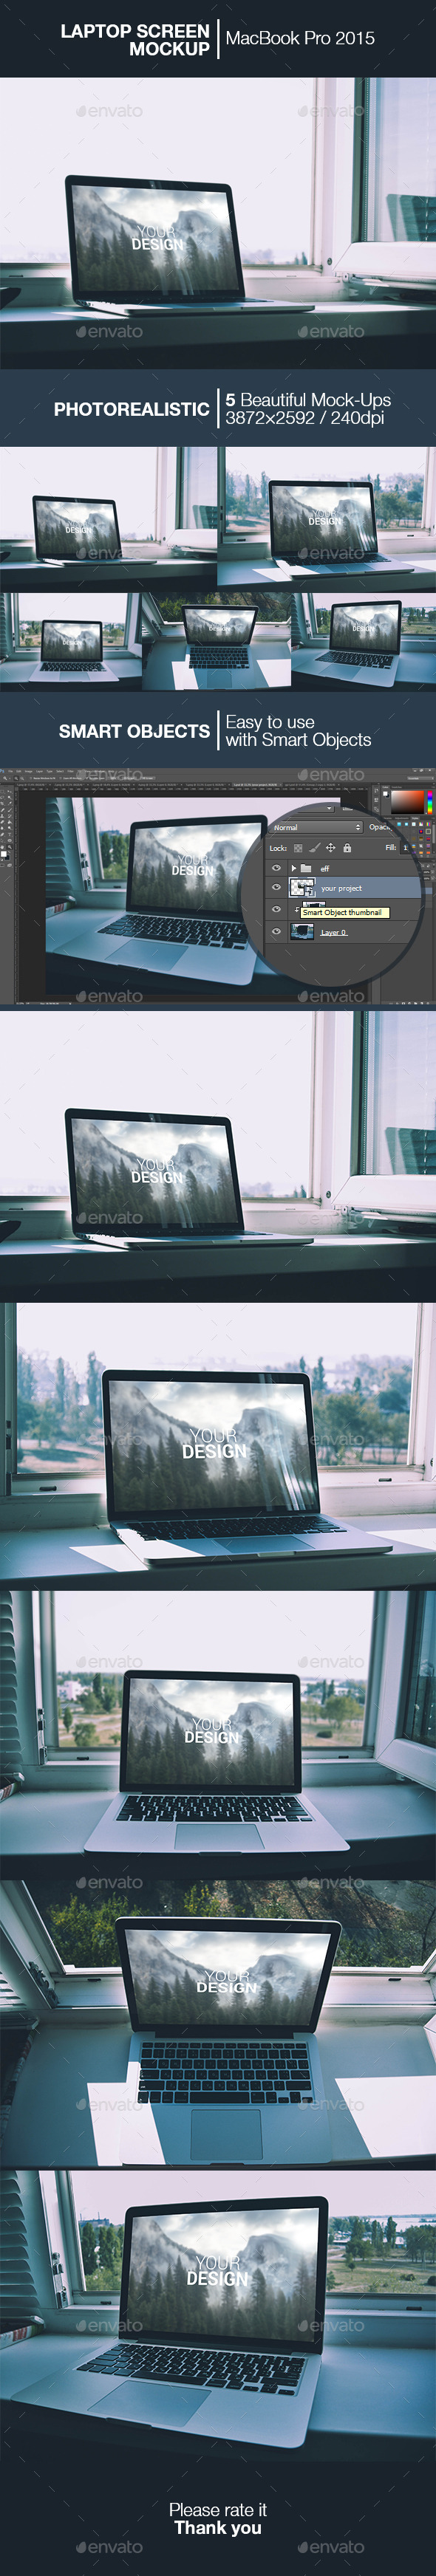 Laptop Screen Mockup | MacBook 2015 - Product Mock-Ups Graphics